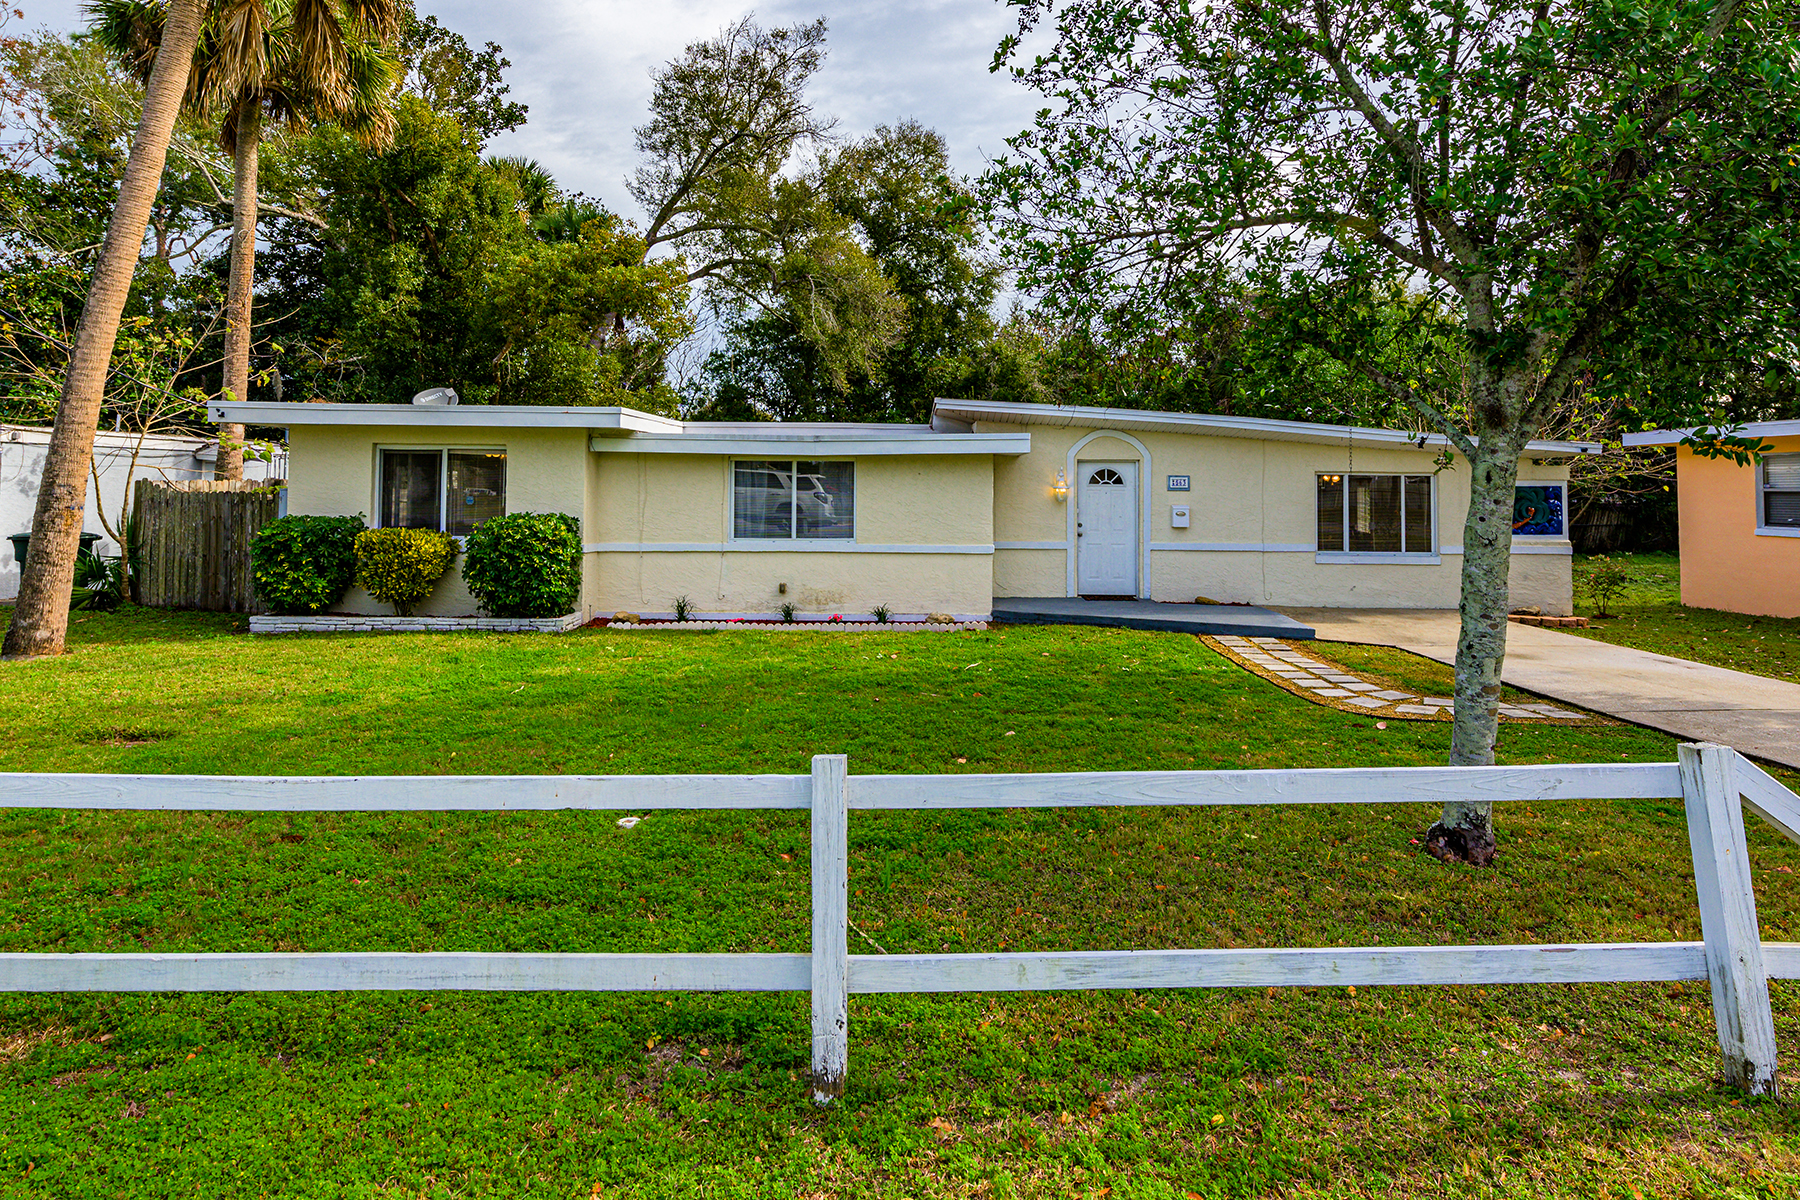 Single Family Homes for Active at Daytona Beach 563 Heineman St Daytona Beach, Florida 32114 United States